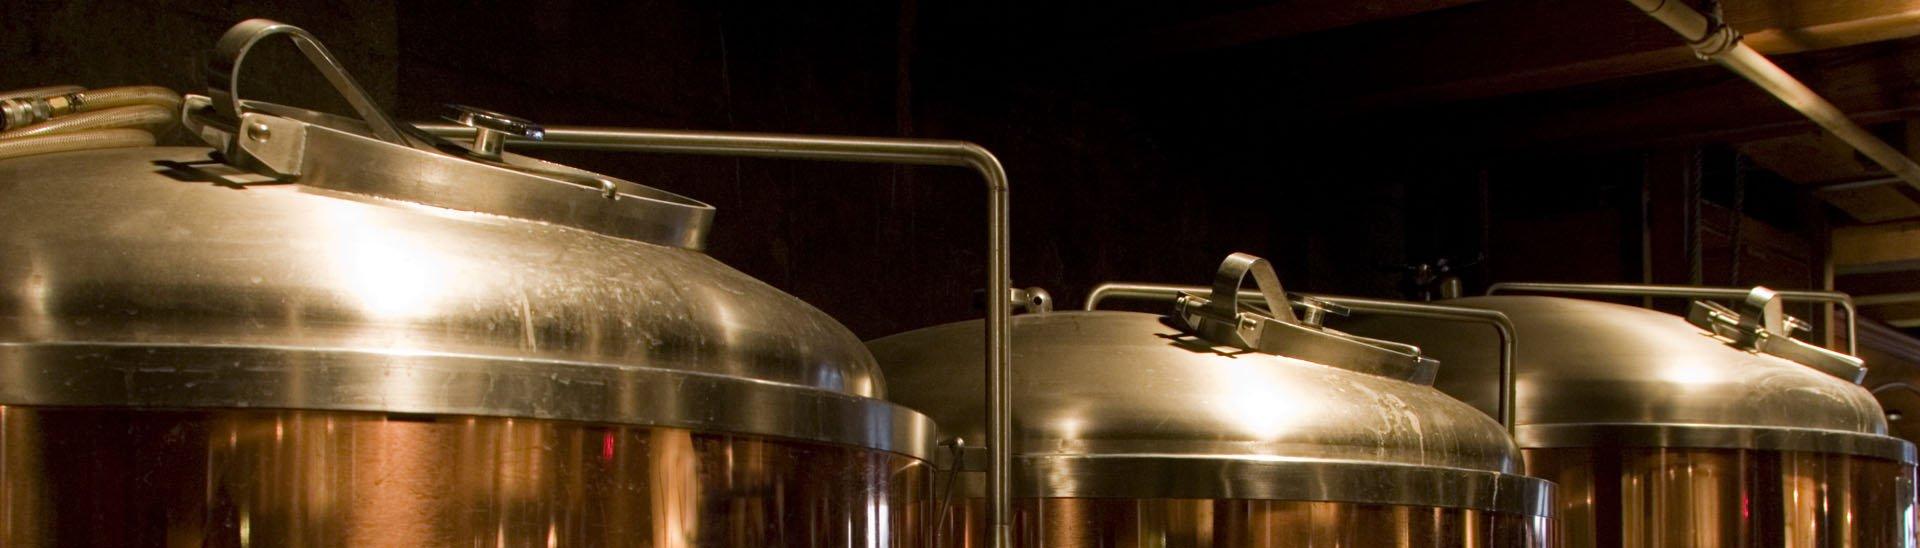 Craft Brewery Insurance